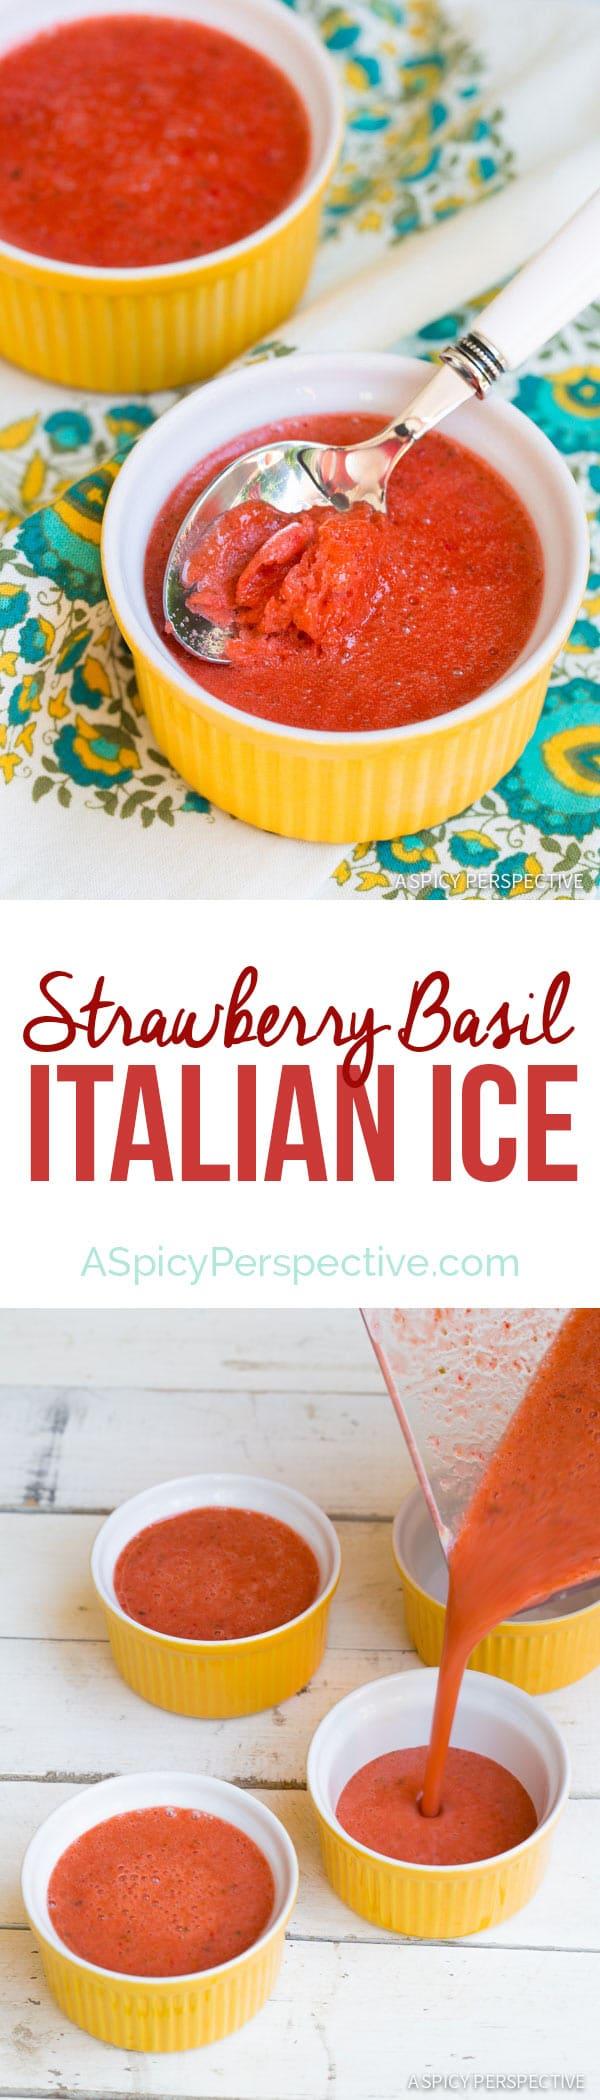 The Best Strawberry Basil Italian Ice on ASpicyPerspective.com